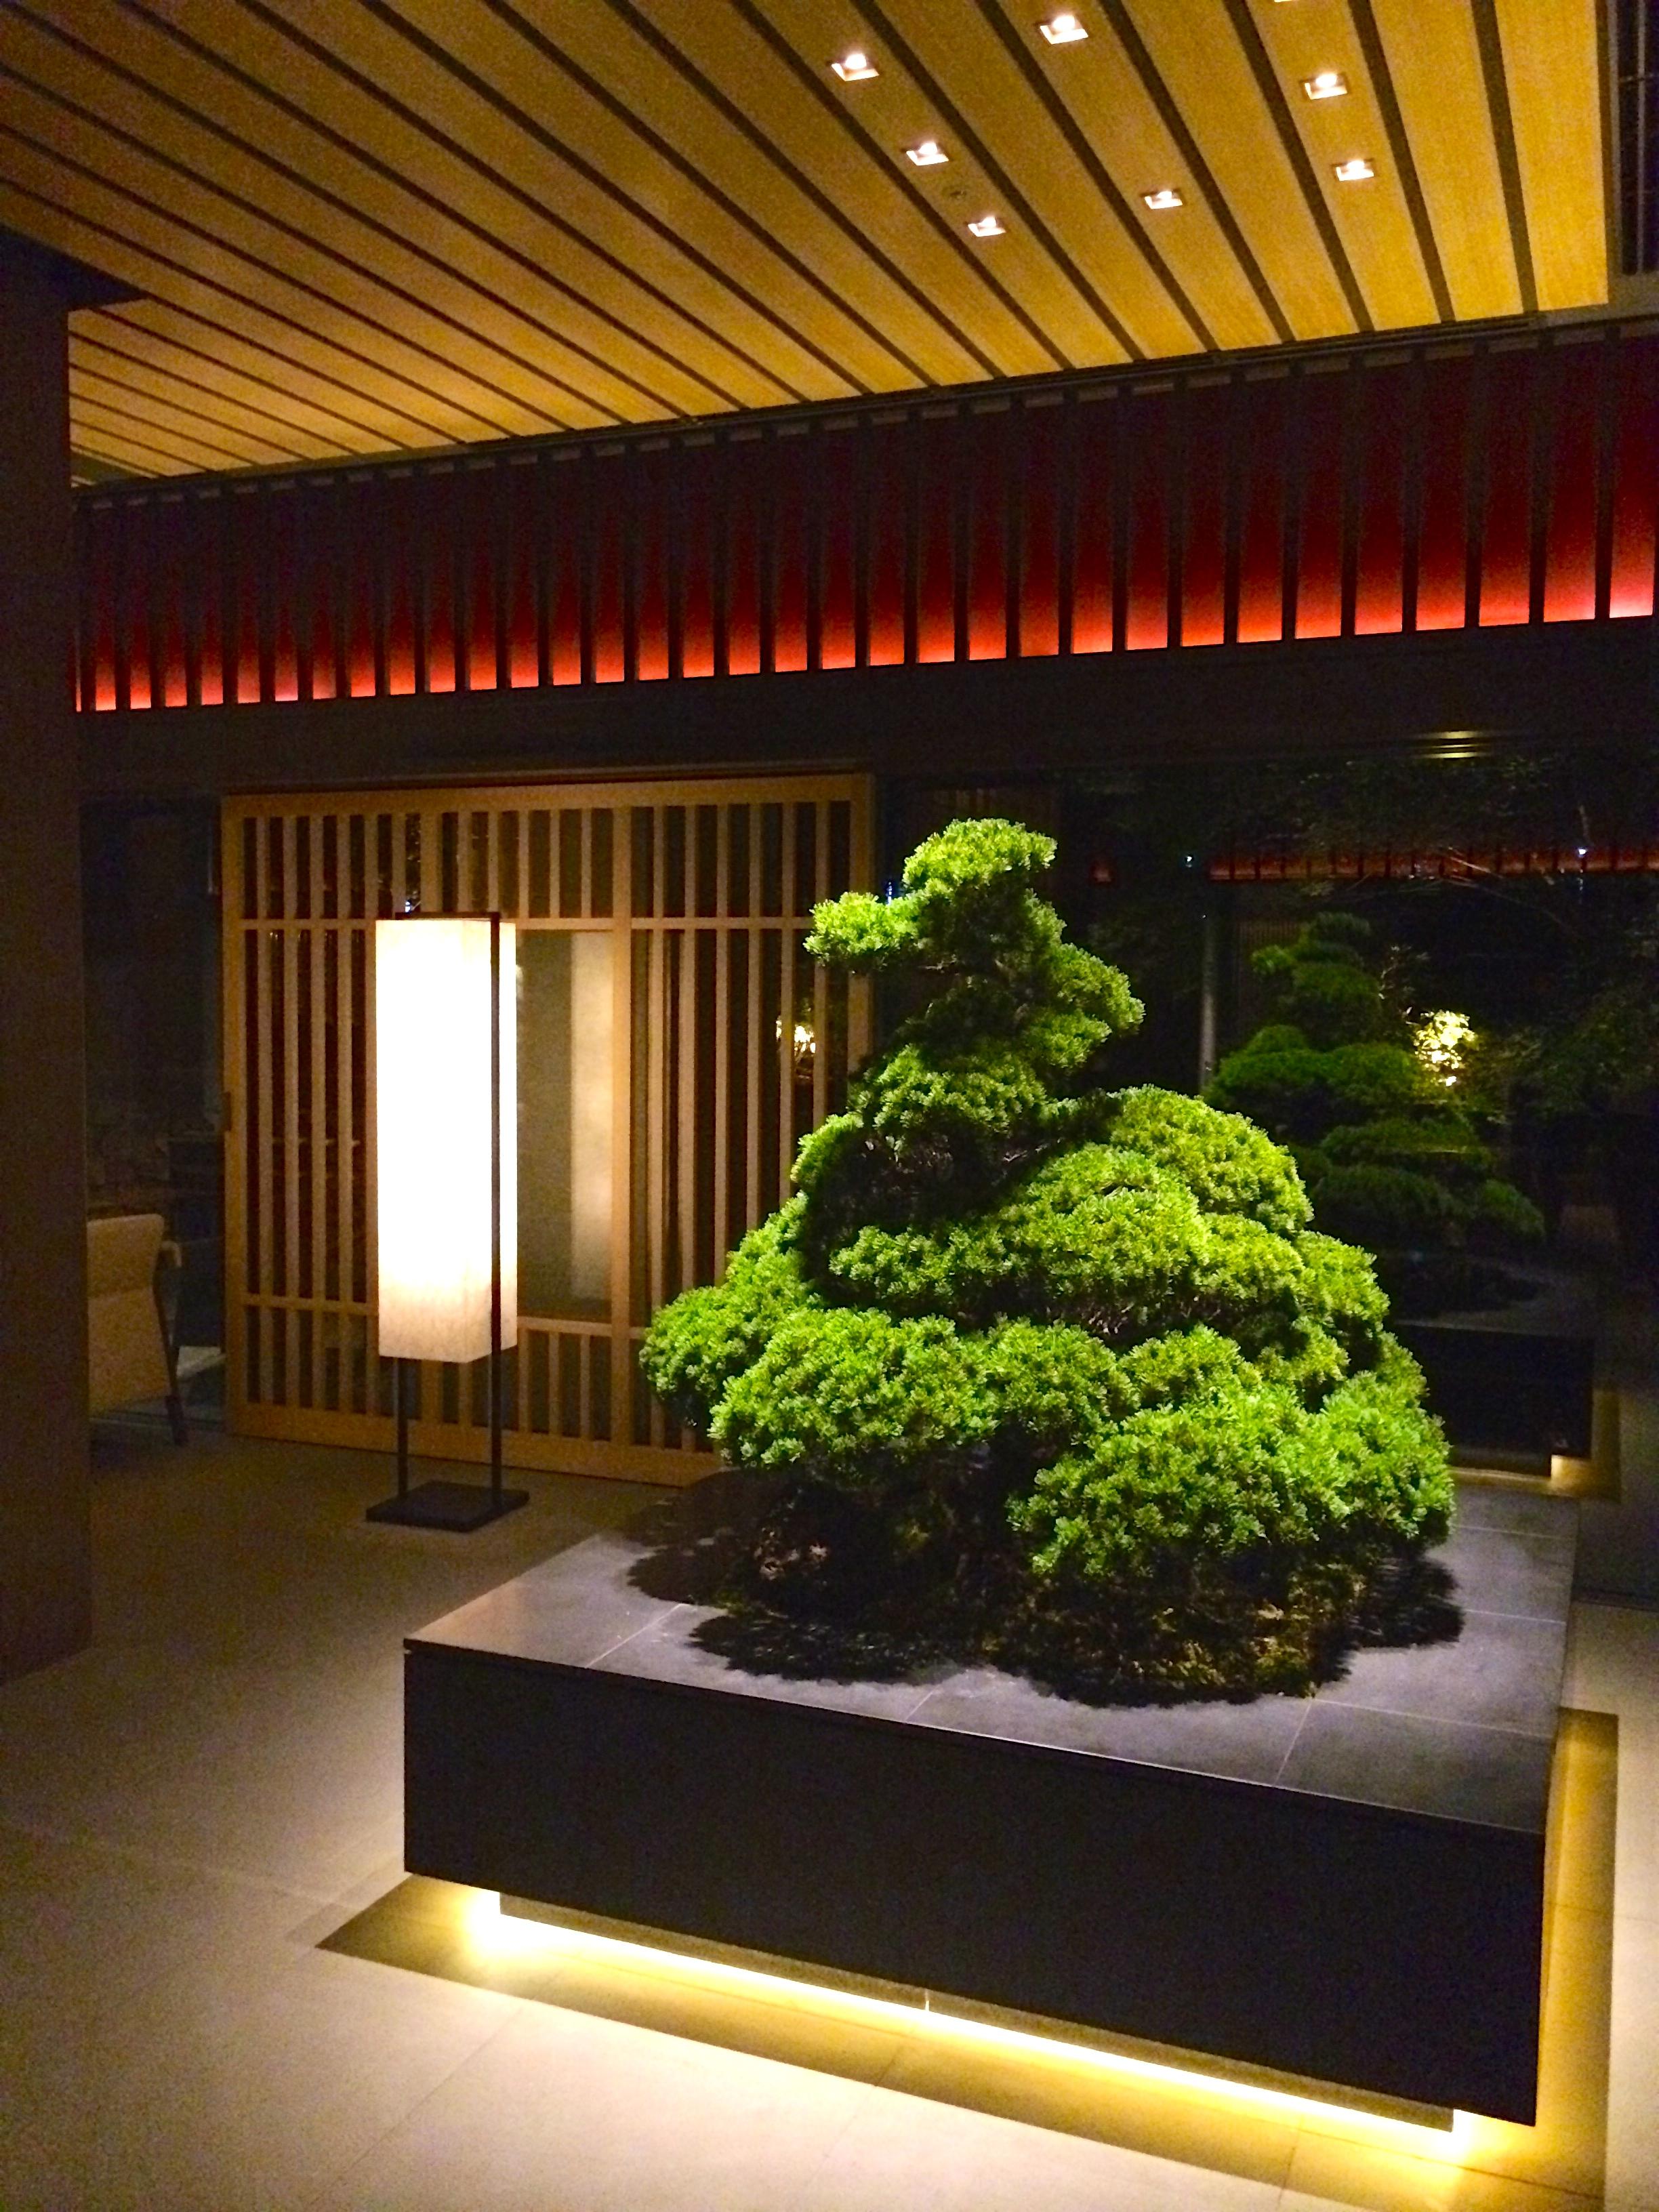 Ritz Carlton Kyoto Japan 5 Star Just Amazing